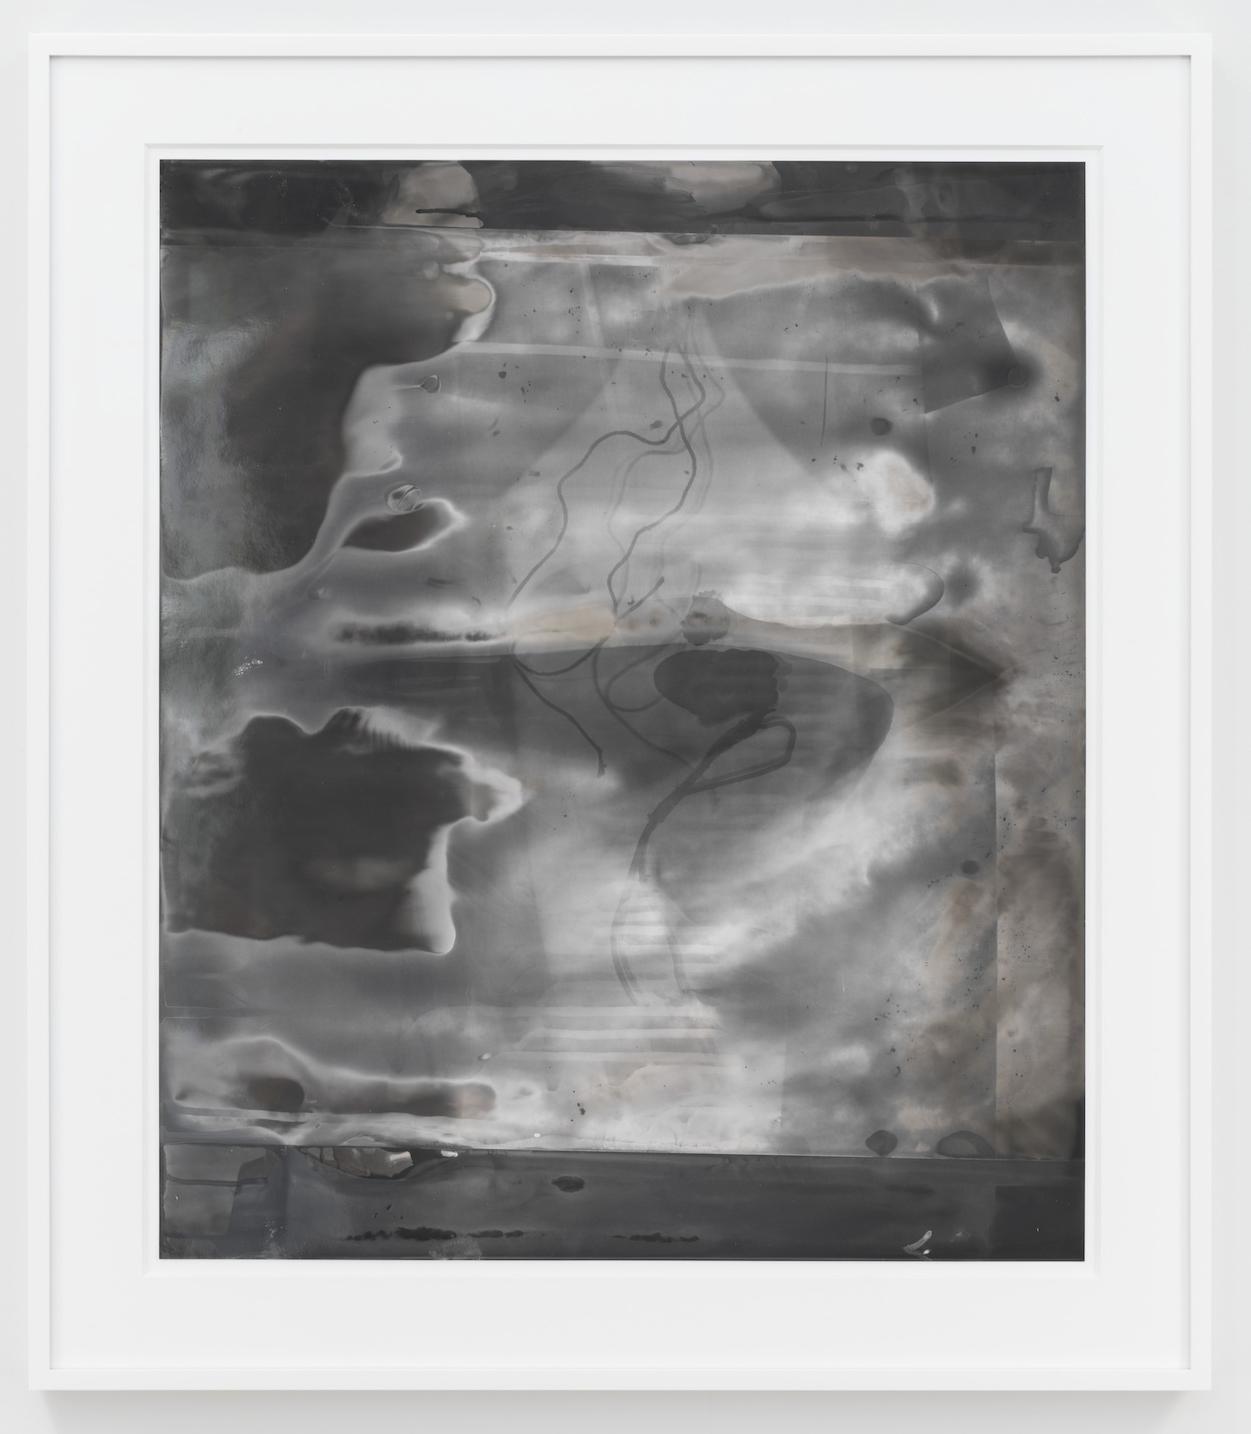 Untitled 2013 Unique silver gelatin print 61 x 50.8 cm / 24 x 20 in, 74.5 x 64.3 cm / 29.5 x 27.3 in framed